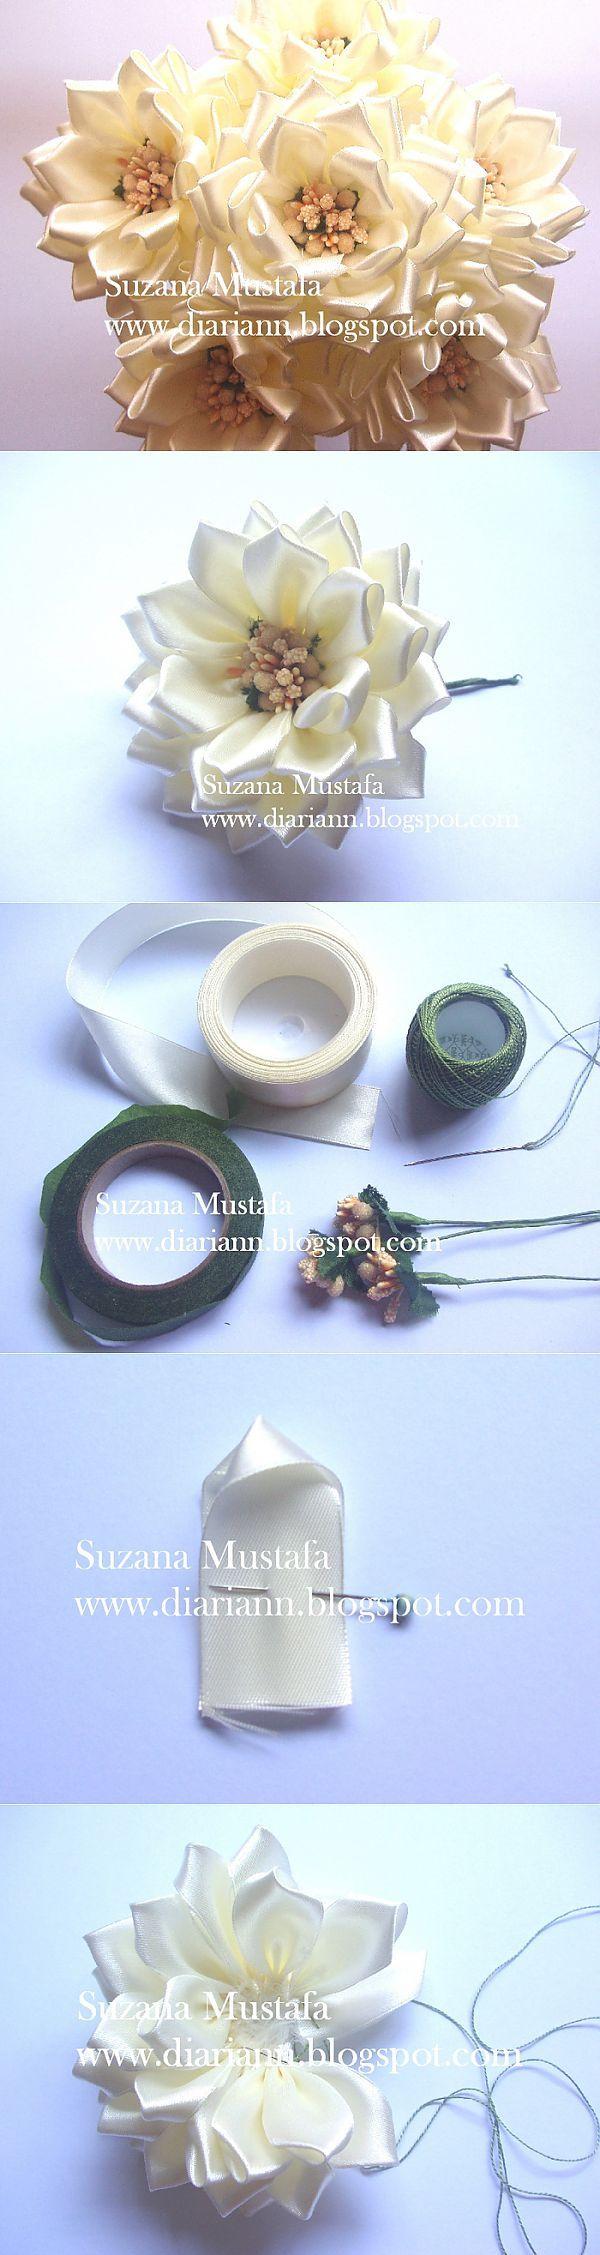 Цветы из шелковых лент от Suzana Mustafa. Идеи и мастер-класс.